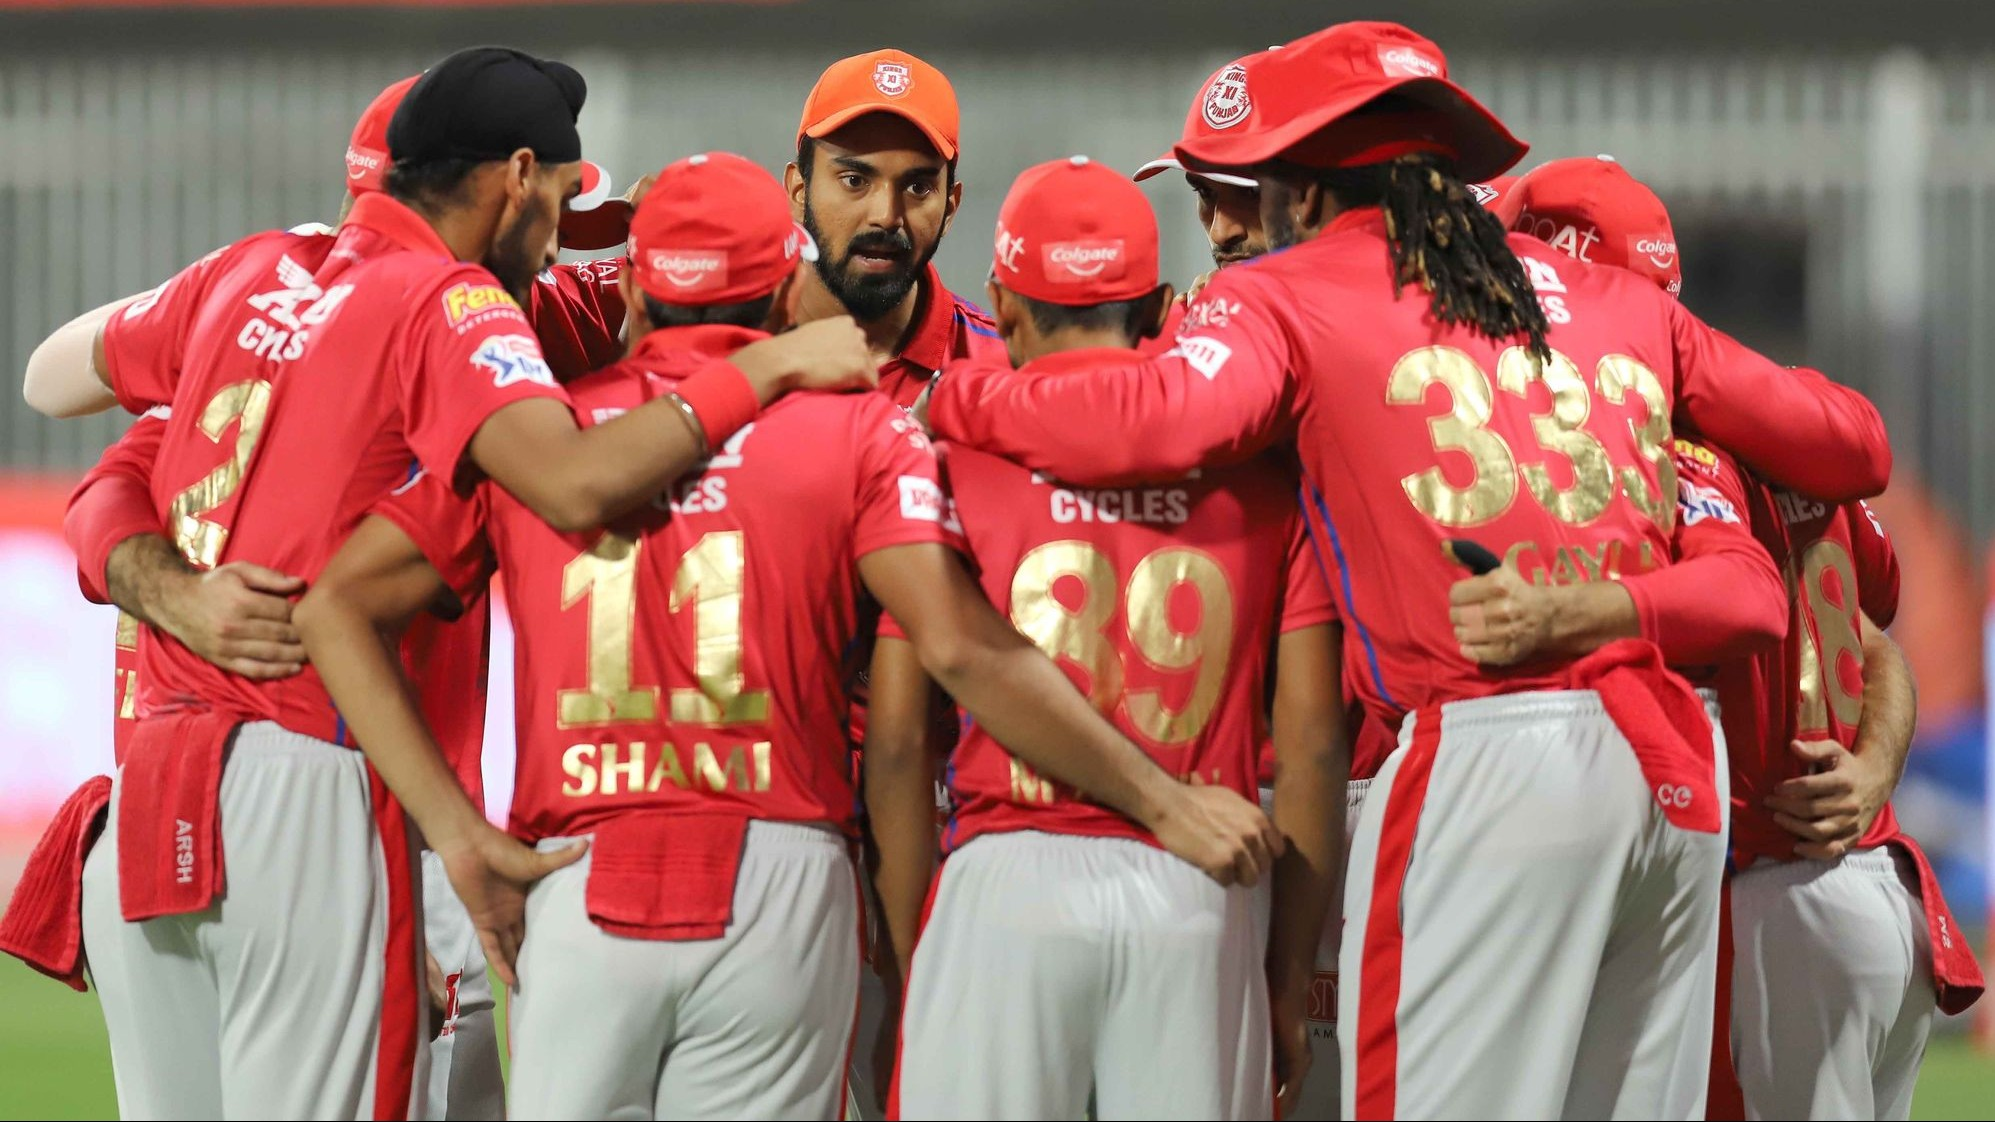 IPL 2020: Kings XI Punjab (KXIP) - Statistical Highlights